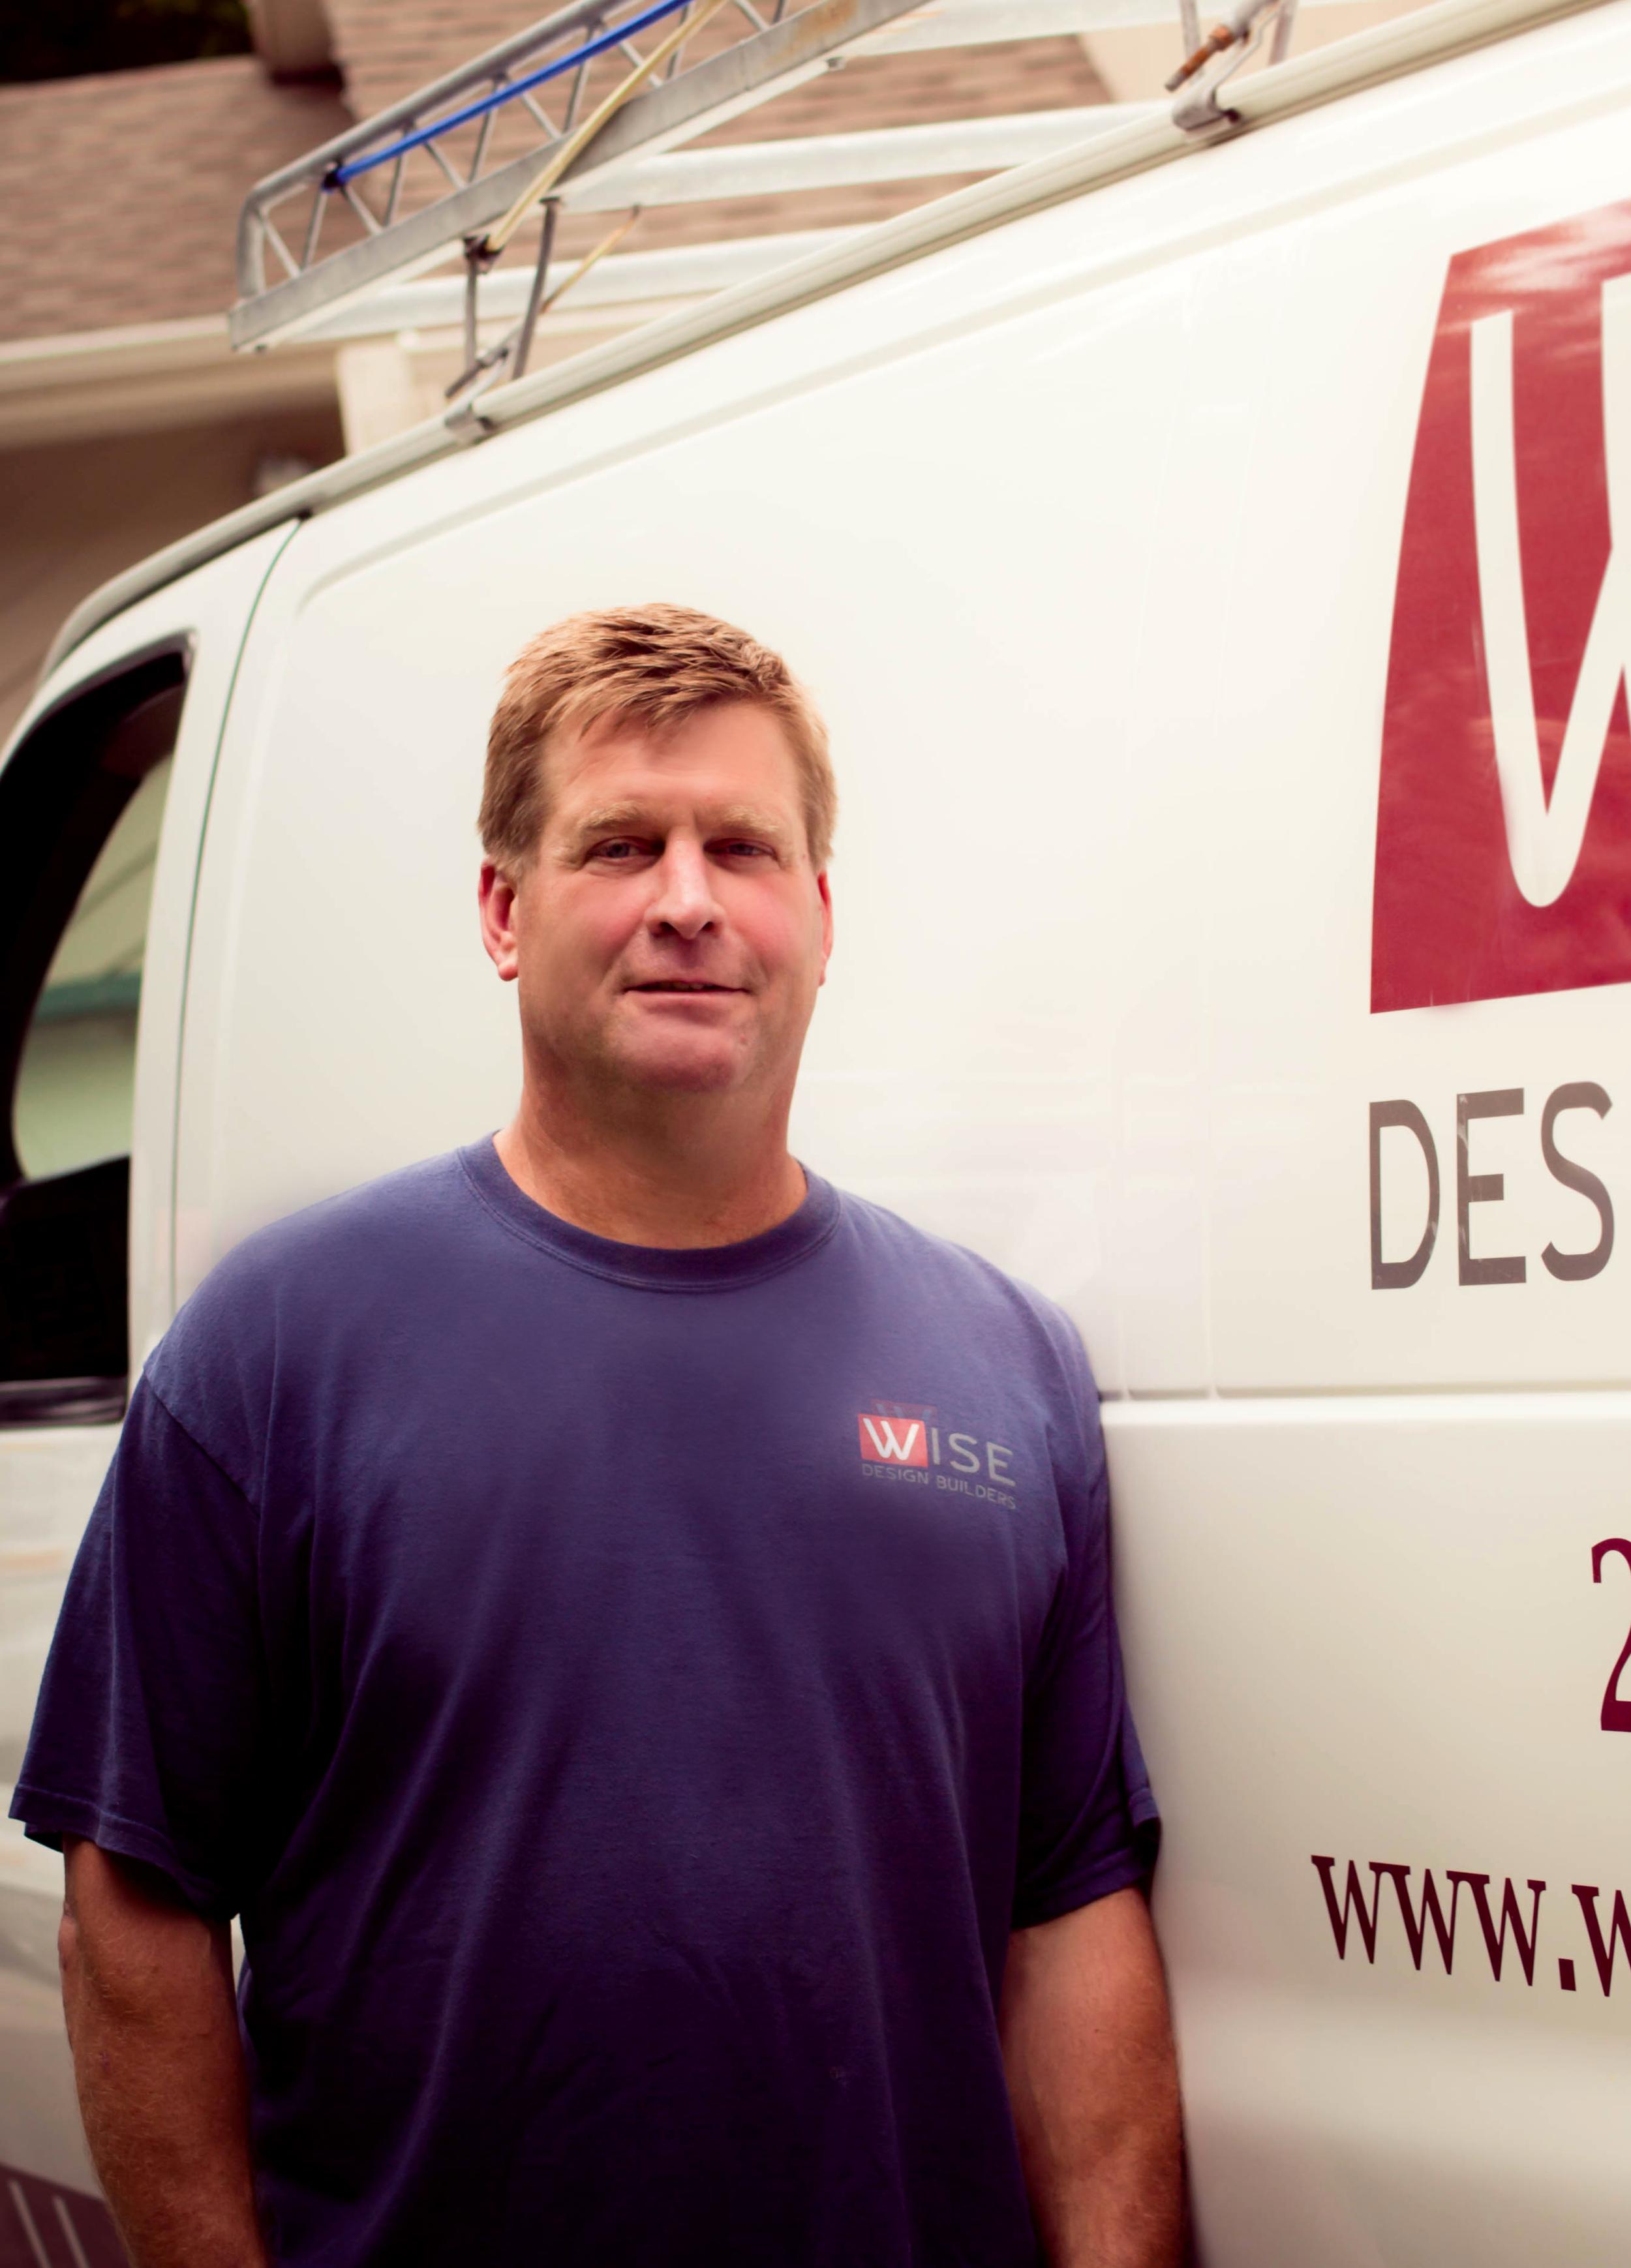 Todd Substyk, Lead Carpenter